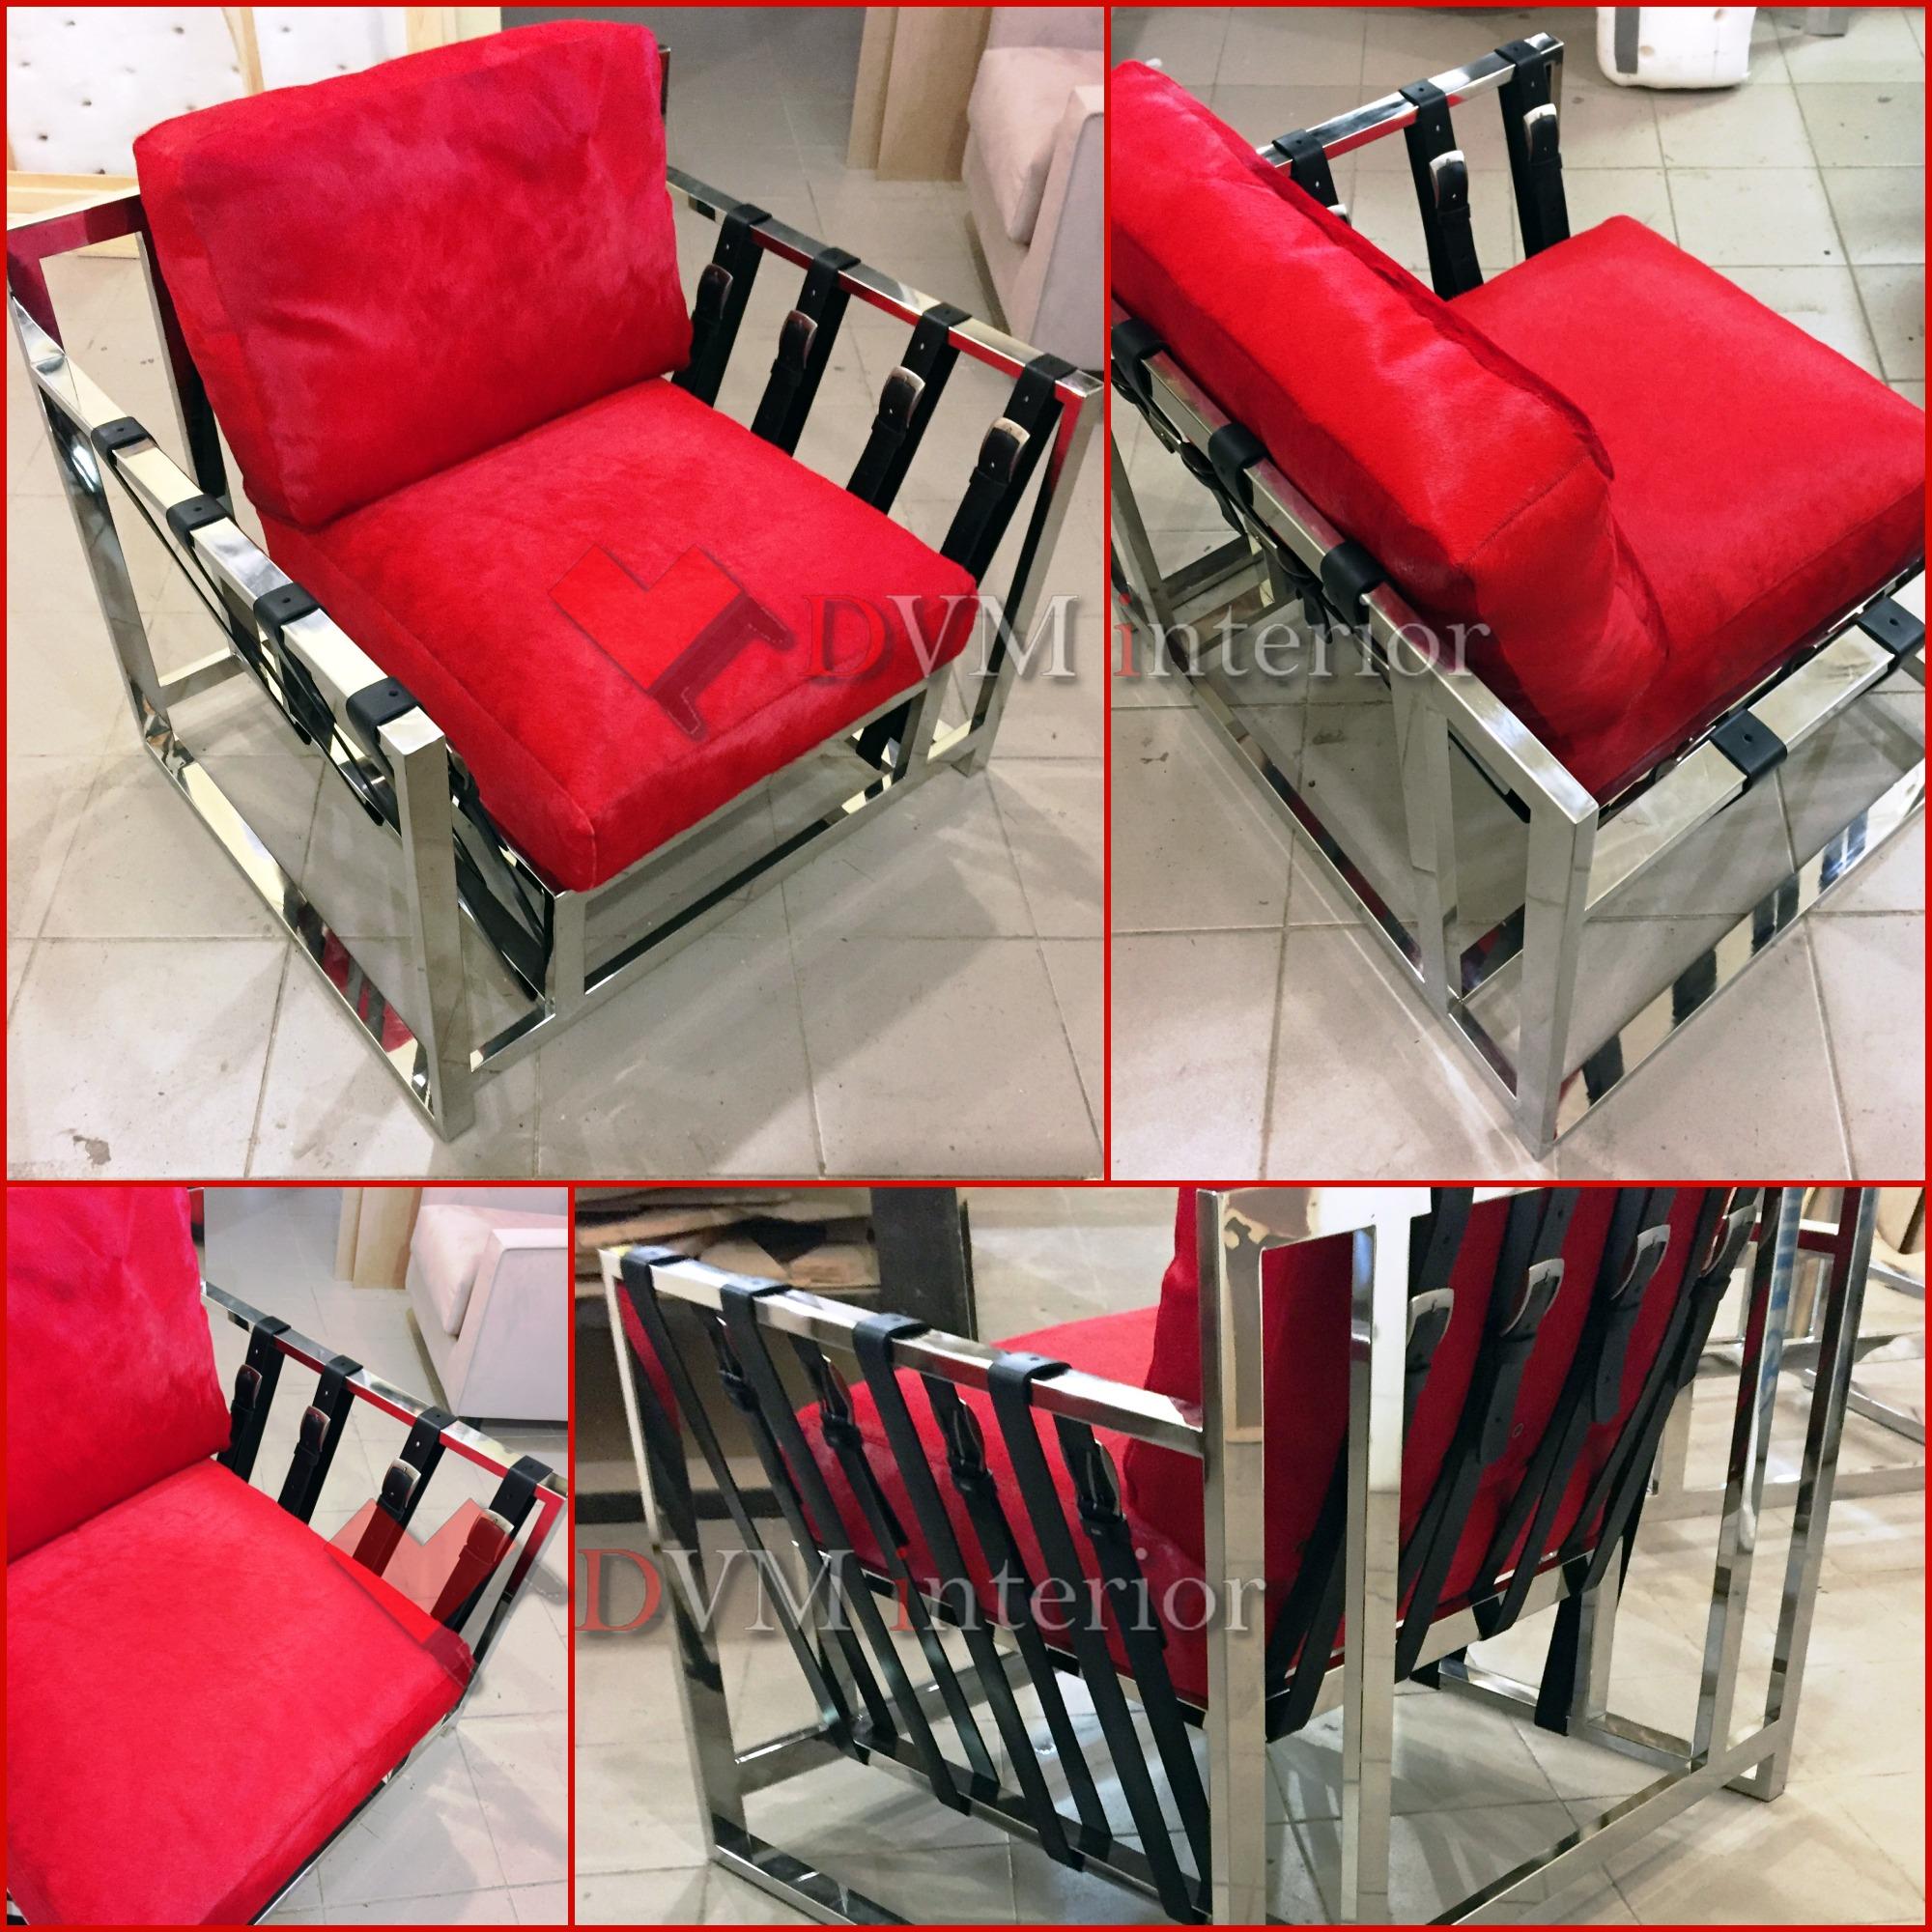 Kreslo krasnoe - Кресло красное